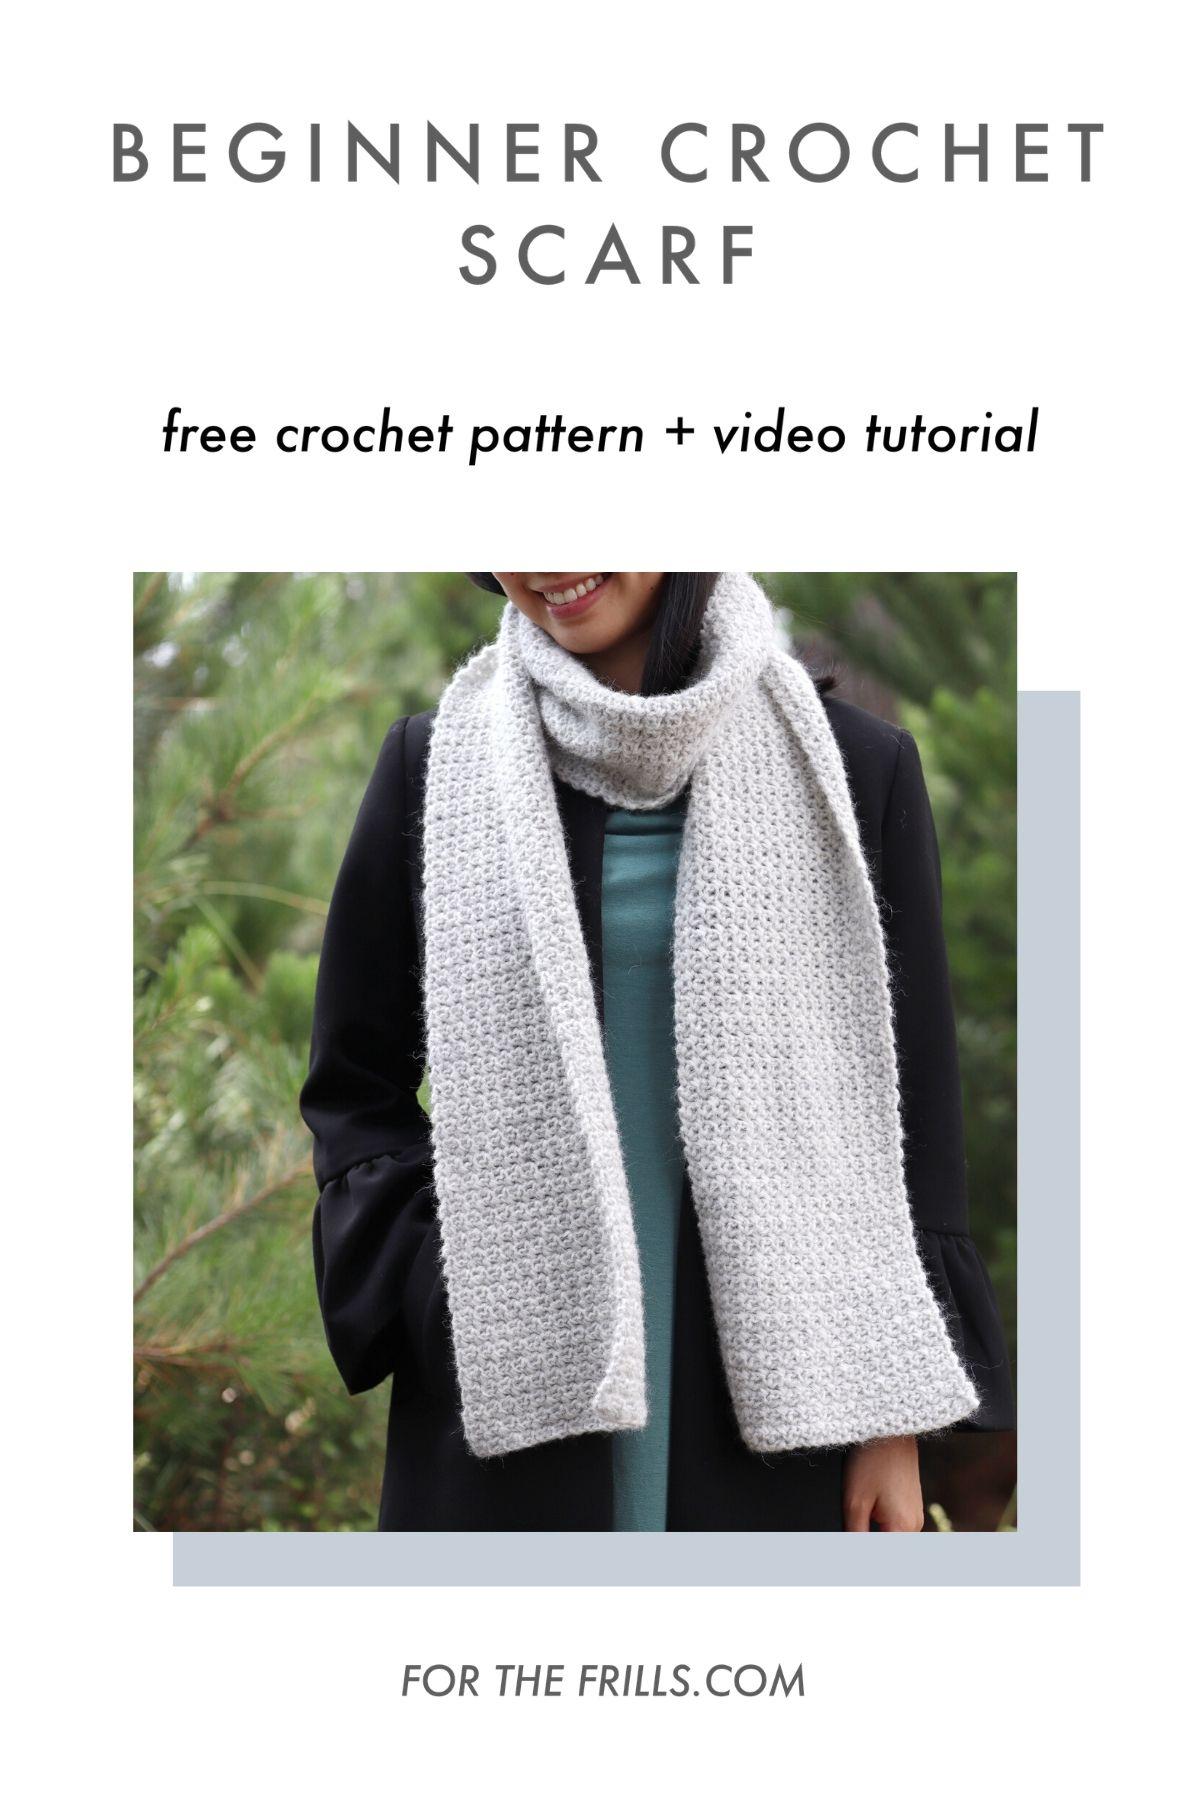 easy beginner crochet scarf pattern free tutorial pin